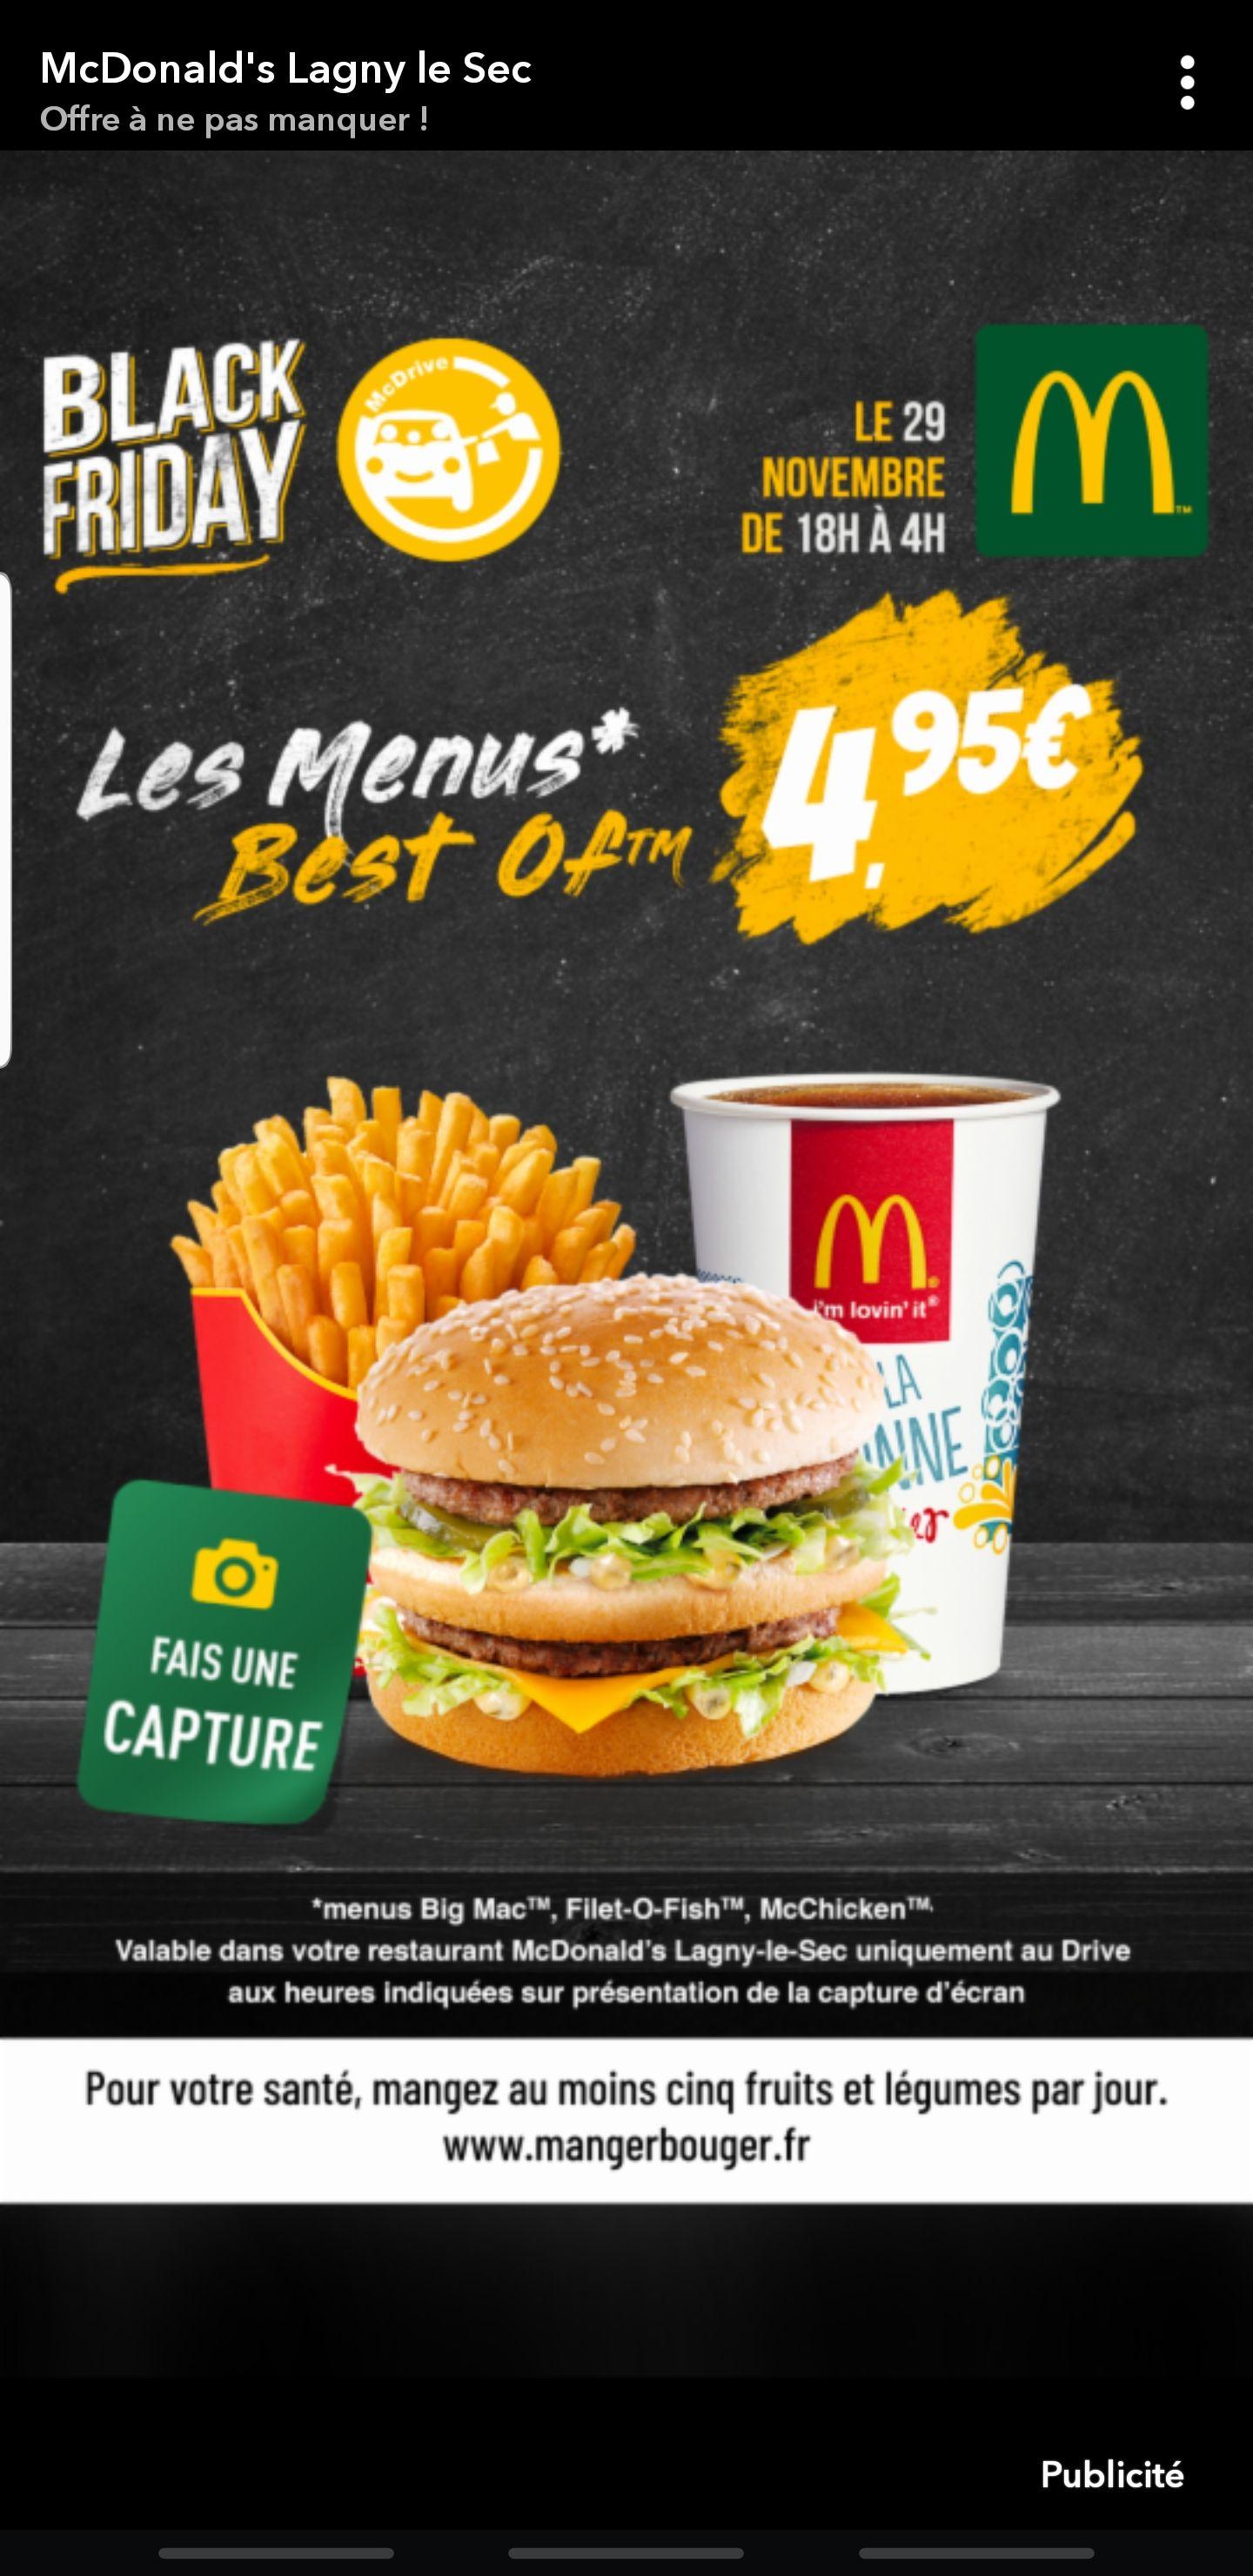 Menu Best Of à 4.95€ - Lagny le Sec (60)